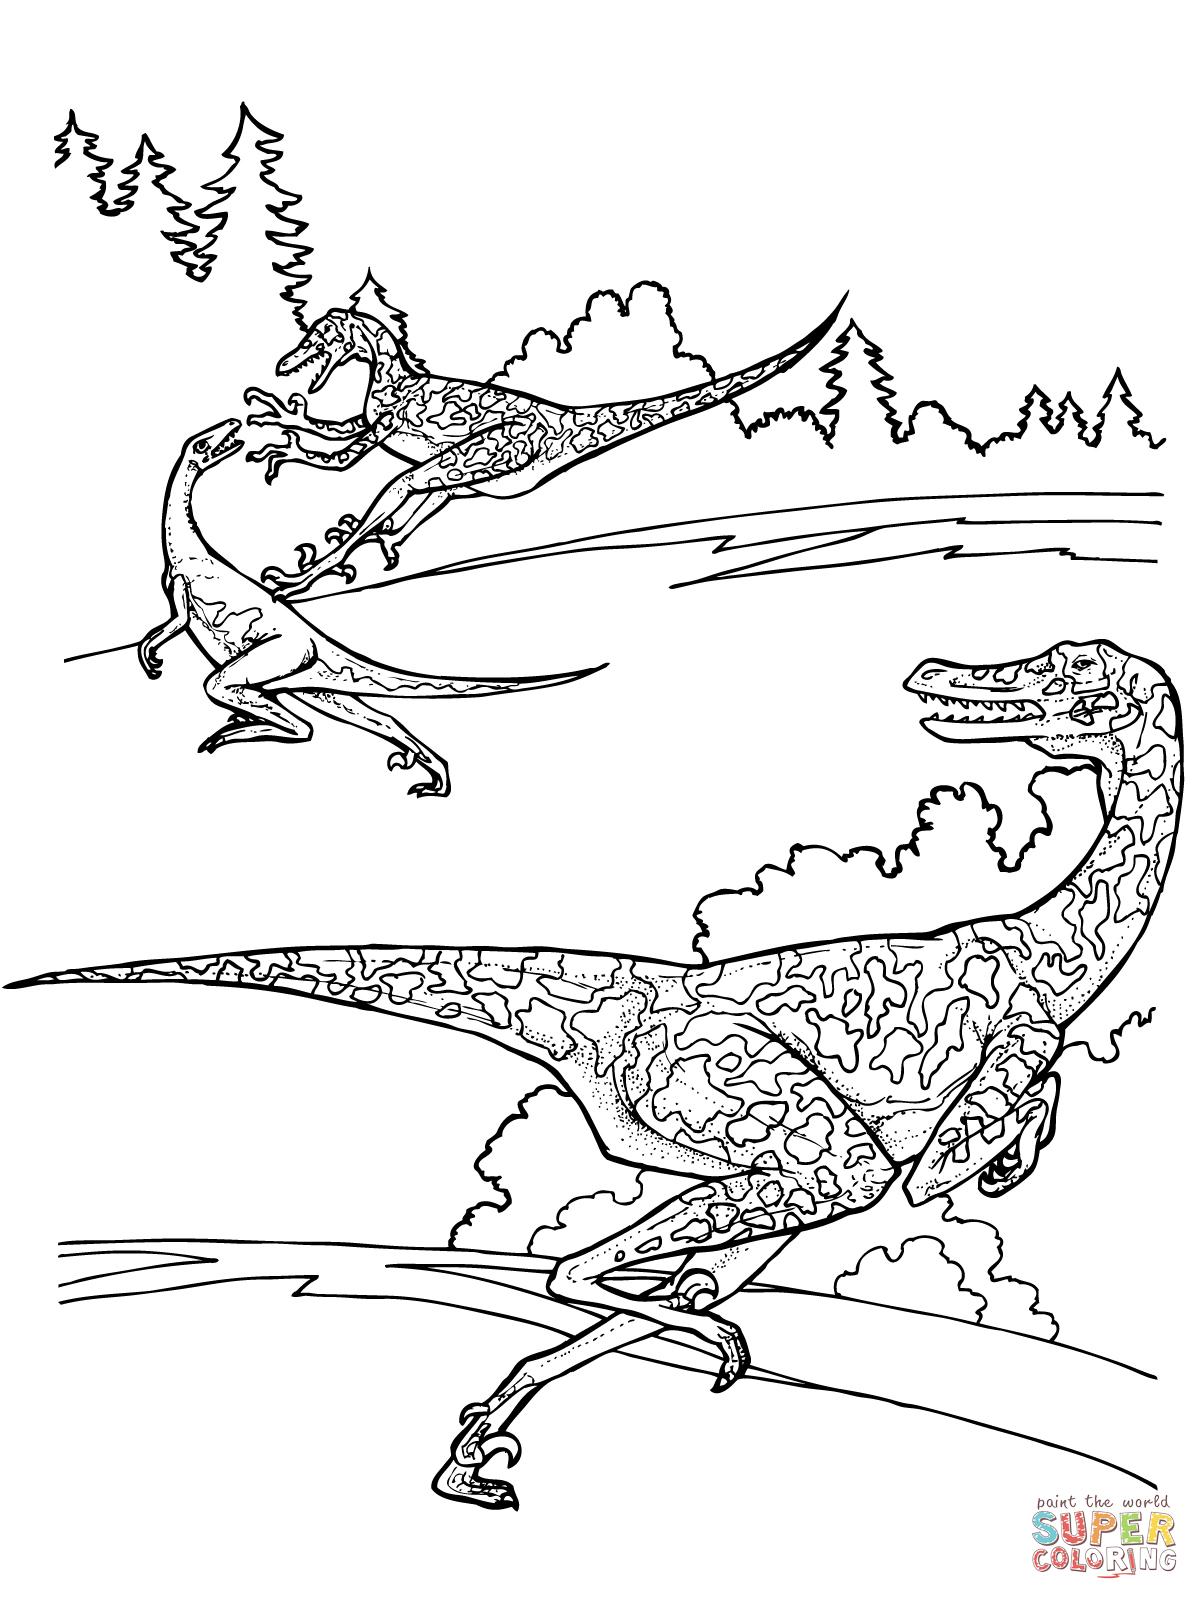 Kleurplaat Jurassic World Indominus Rex 94 Dessins De Coloriage Velociraptor Dinosaure 224 Imprimer